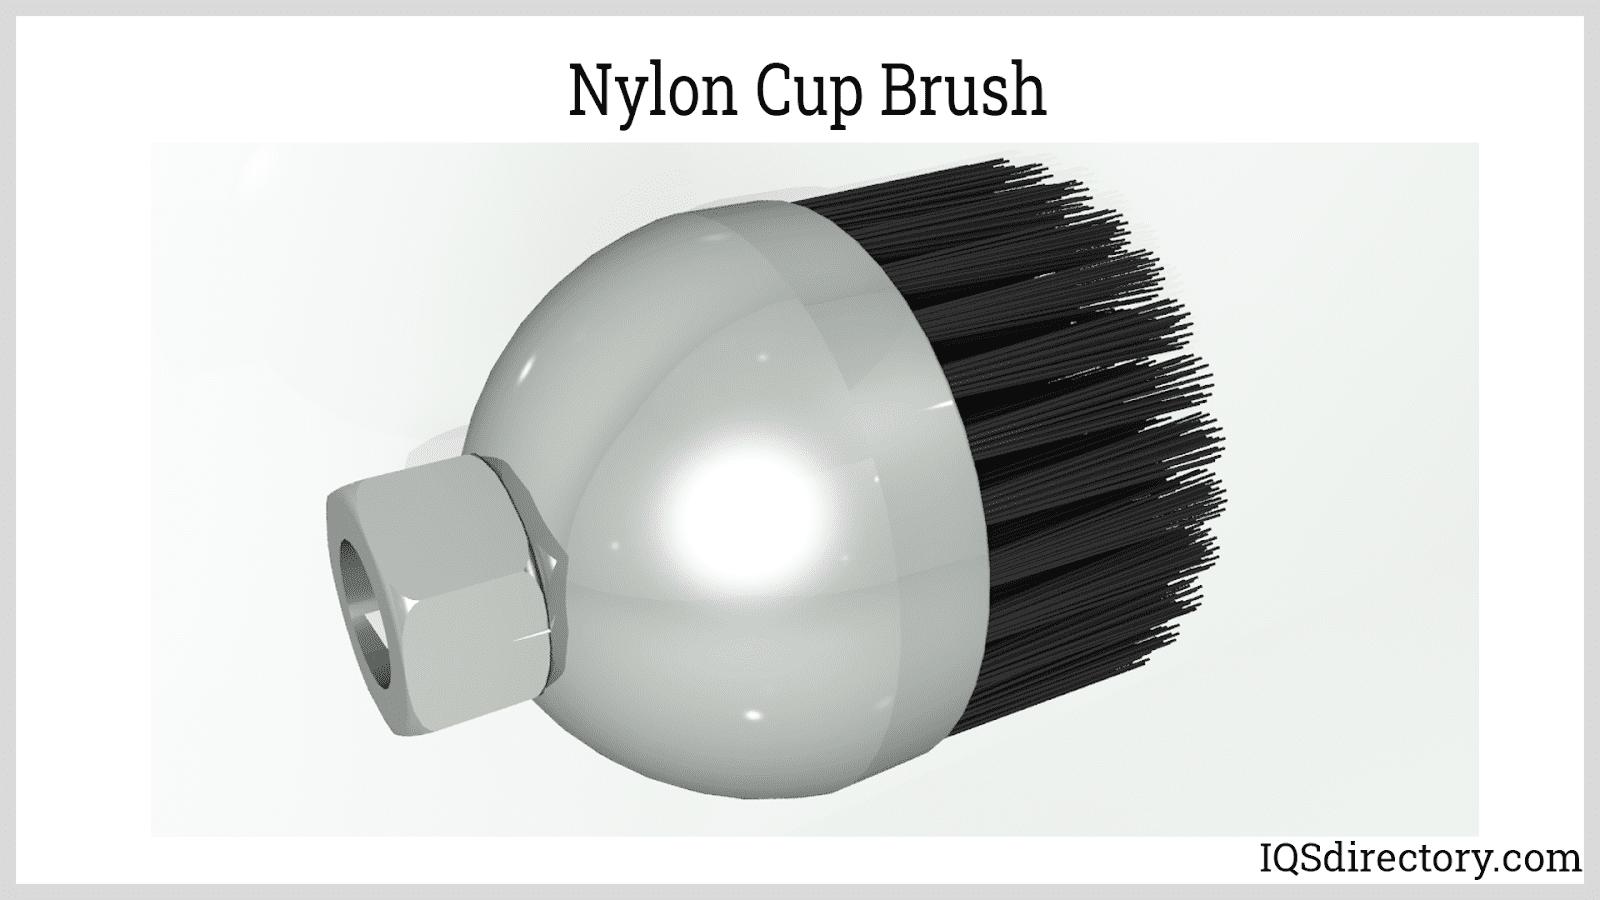 Nylon Cup Brush